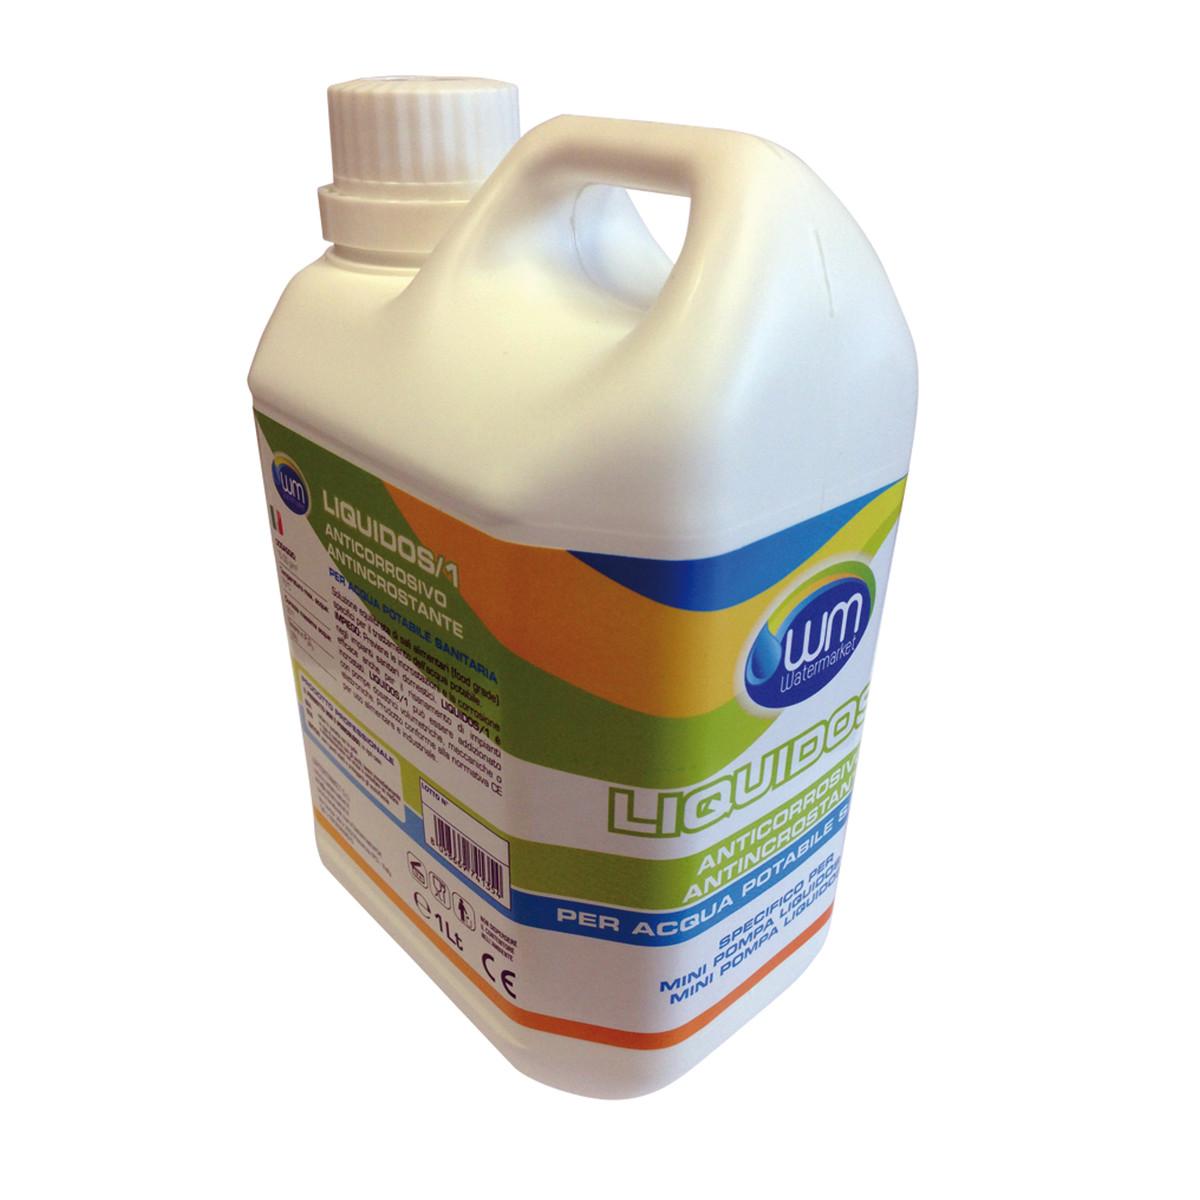 Sali polofosfati in liquido, 1 L